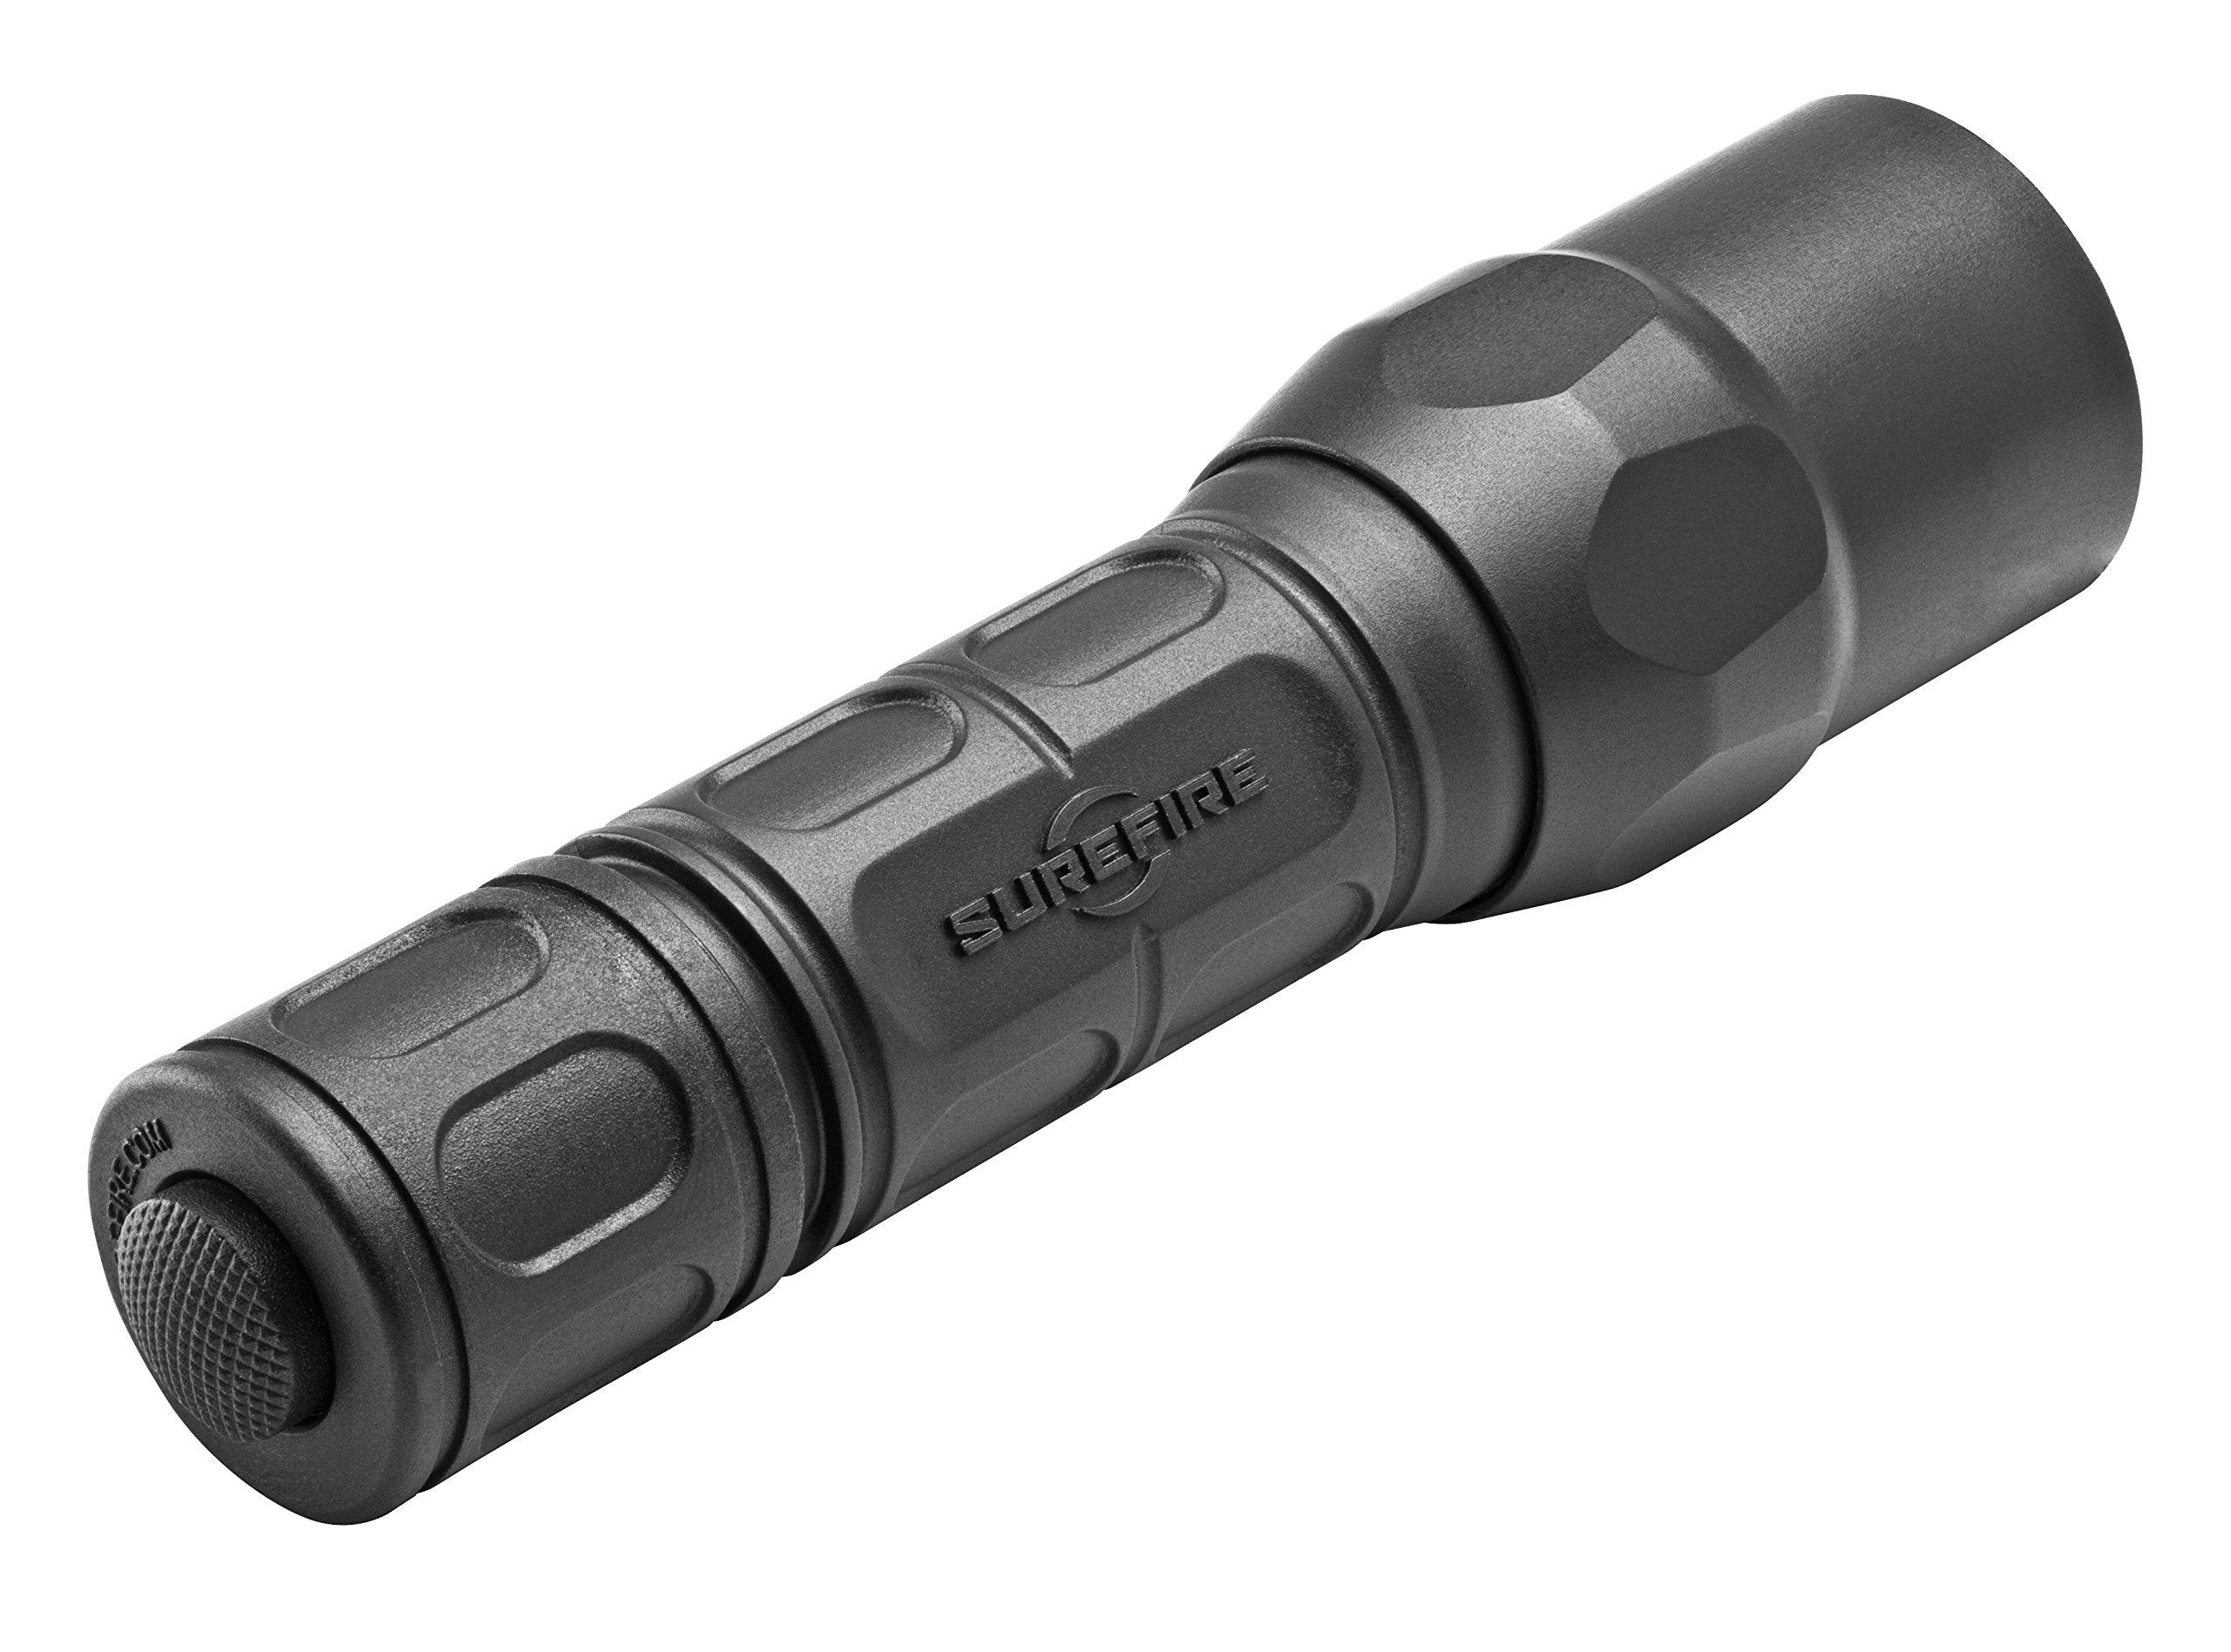 SureFire G2X Pro Dual-Output LED Flashlight with Click Switch, Black by SureFire (Image #3)